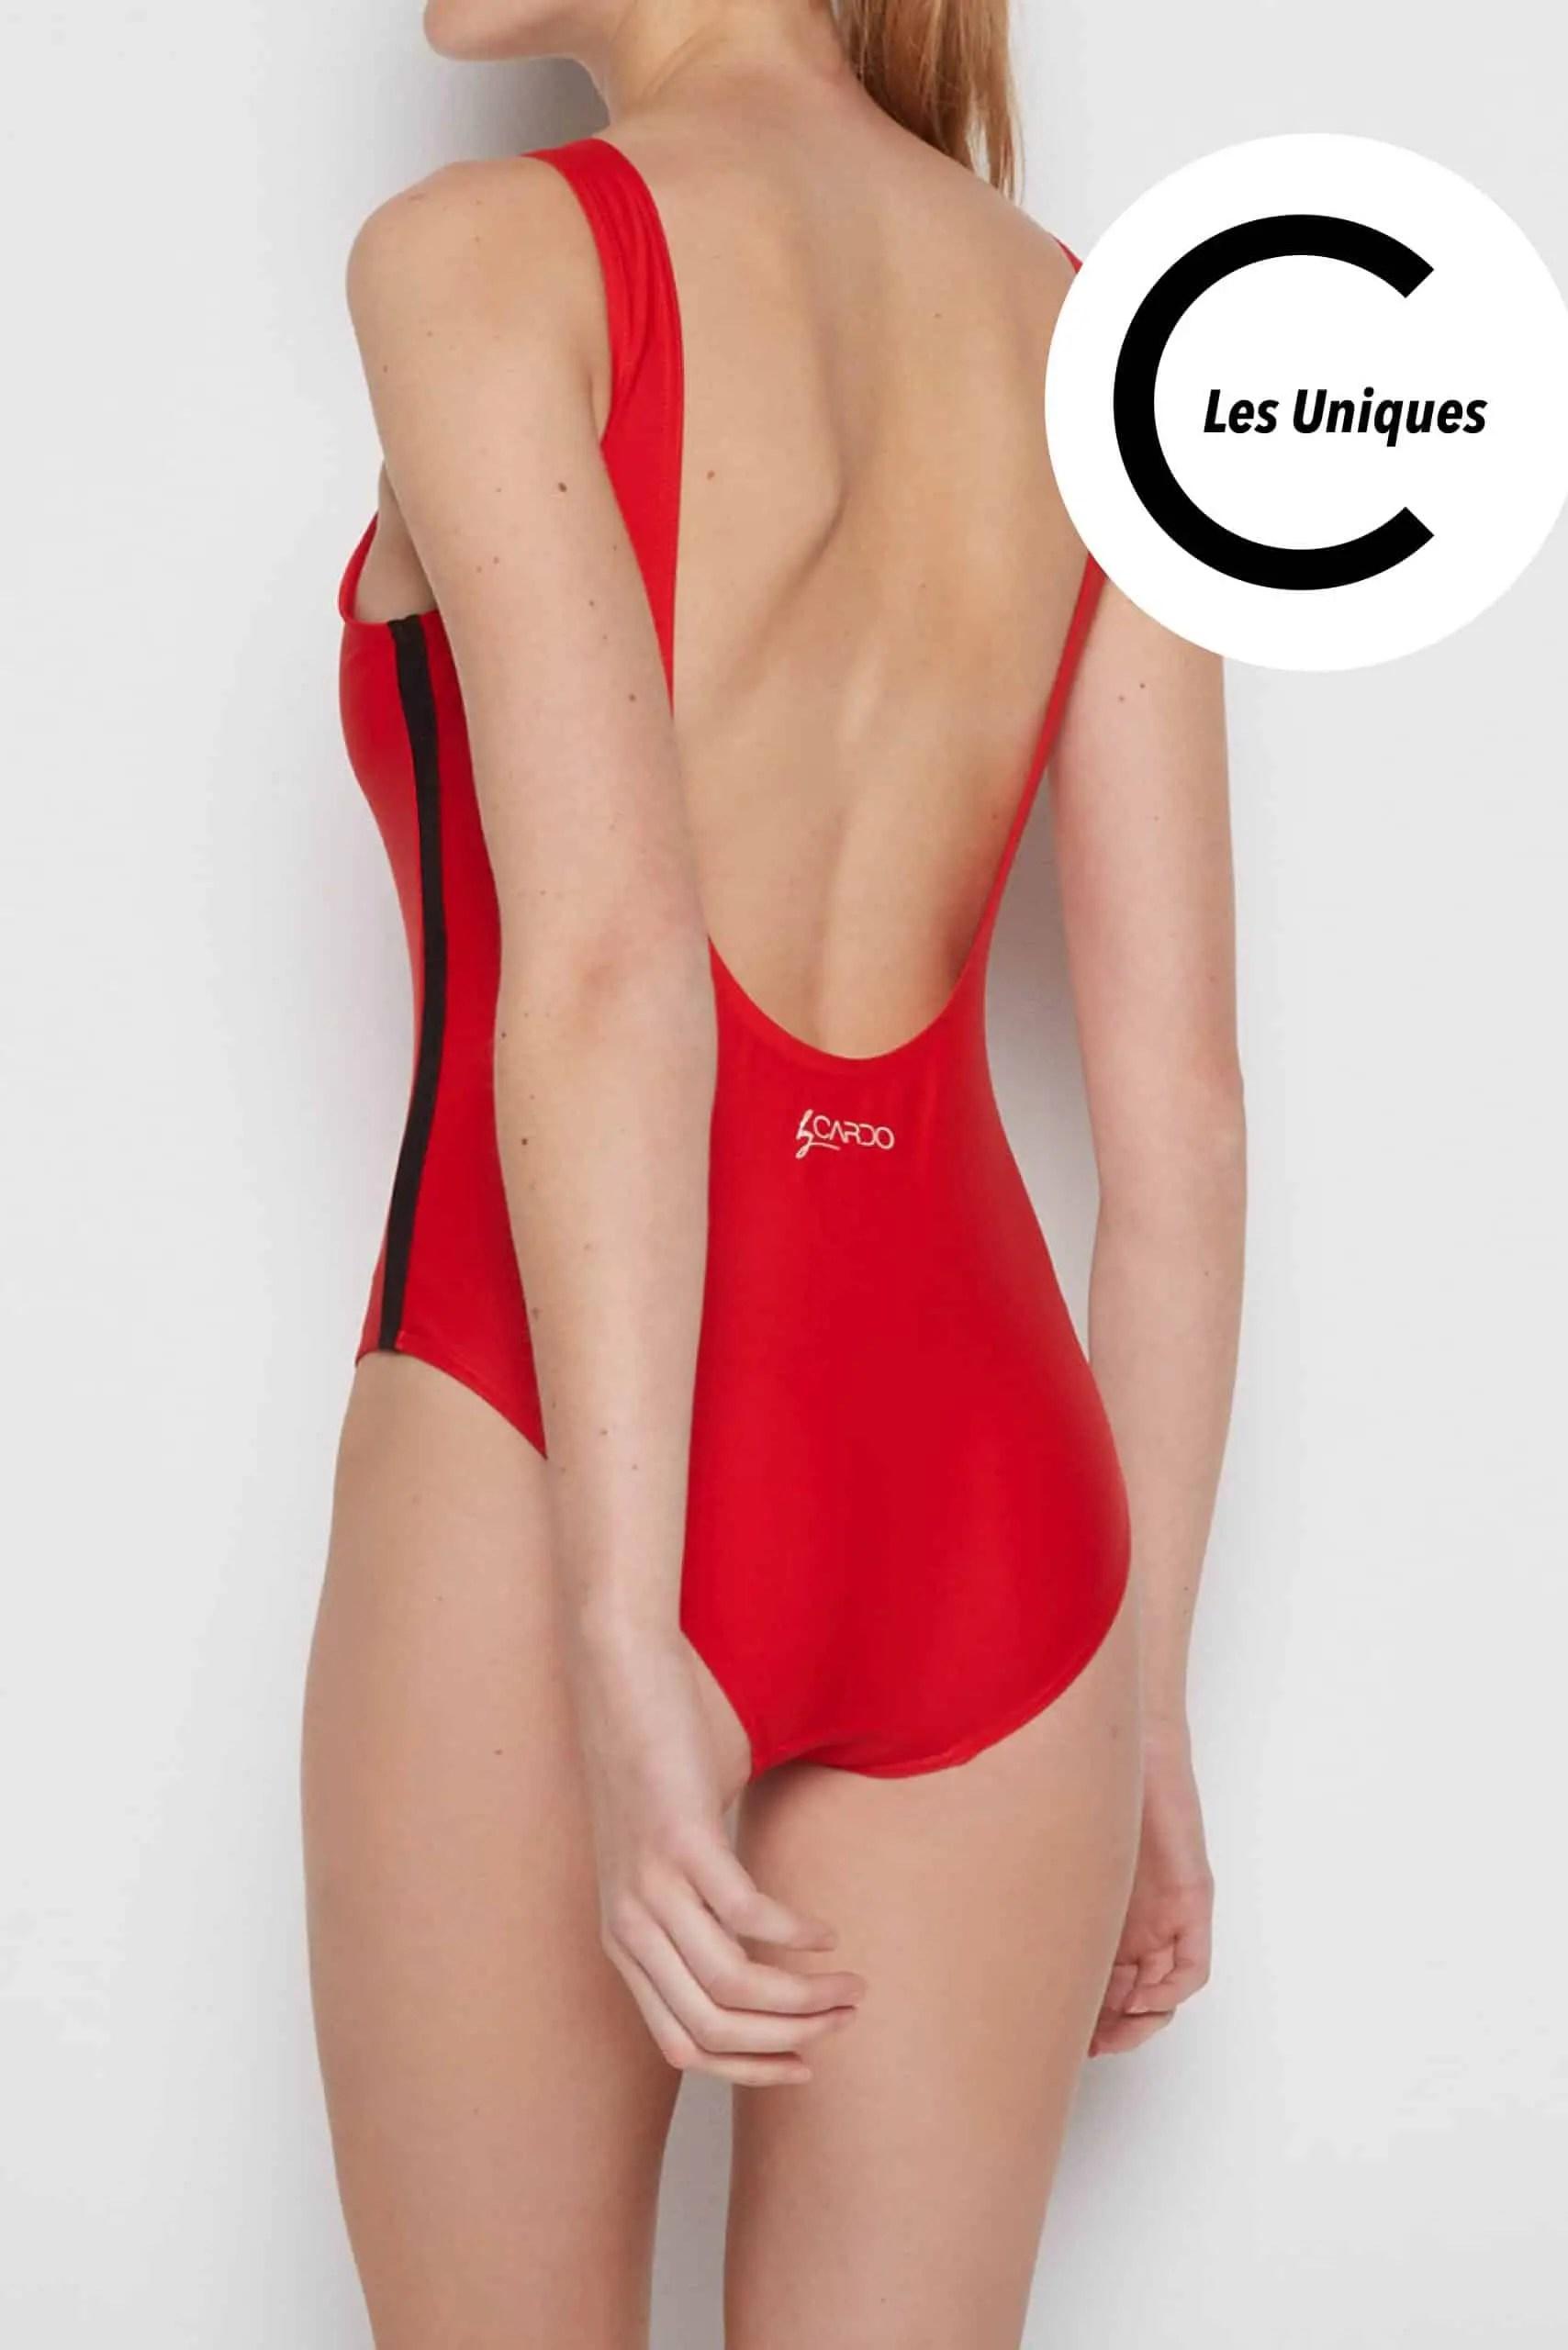 CARDONU CARDO Paris maillot de bain swimwear piscine plage gainant sculptant Uniques